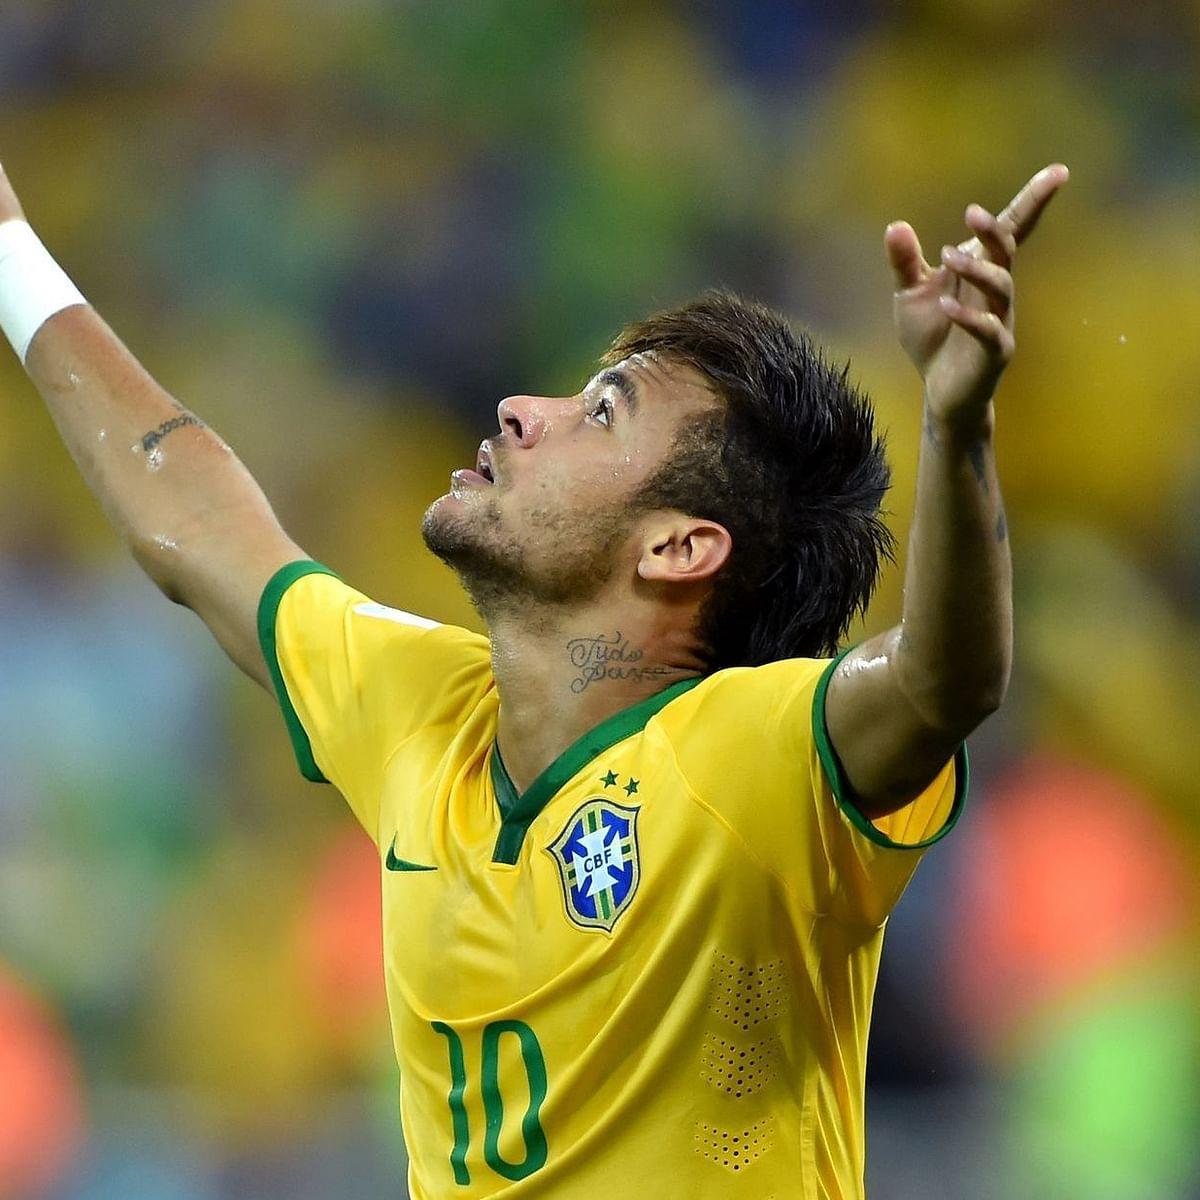 Happy Birthday Neymar - Top 5 unforgettable performances by Brazil's football sensation